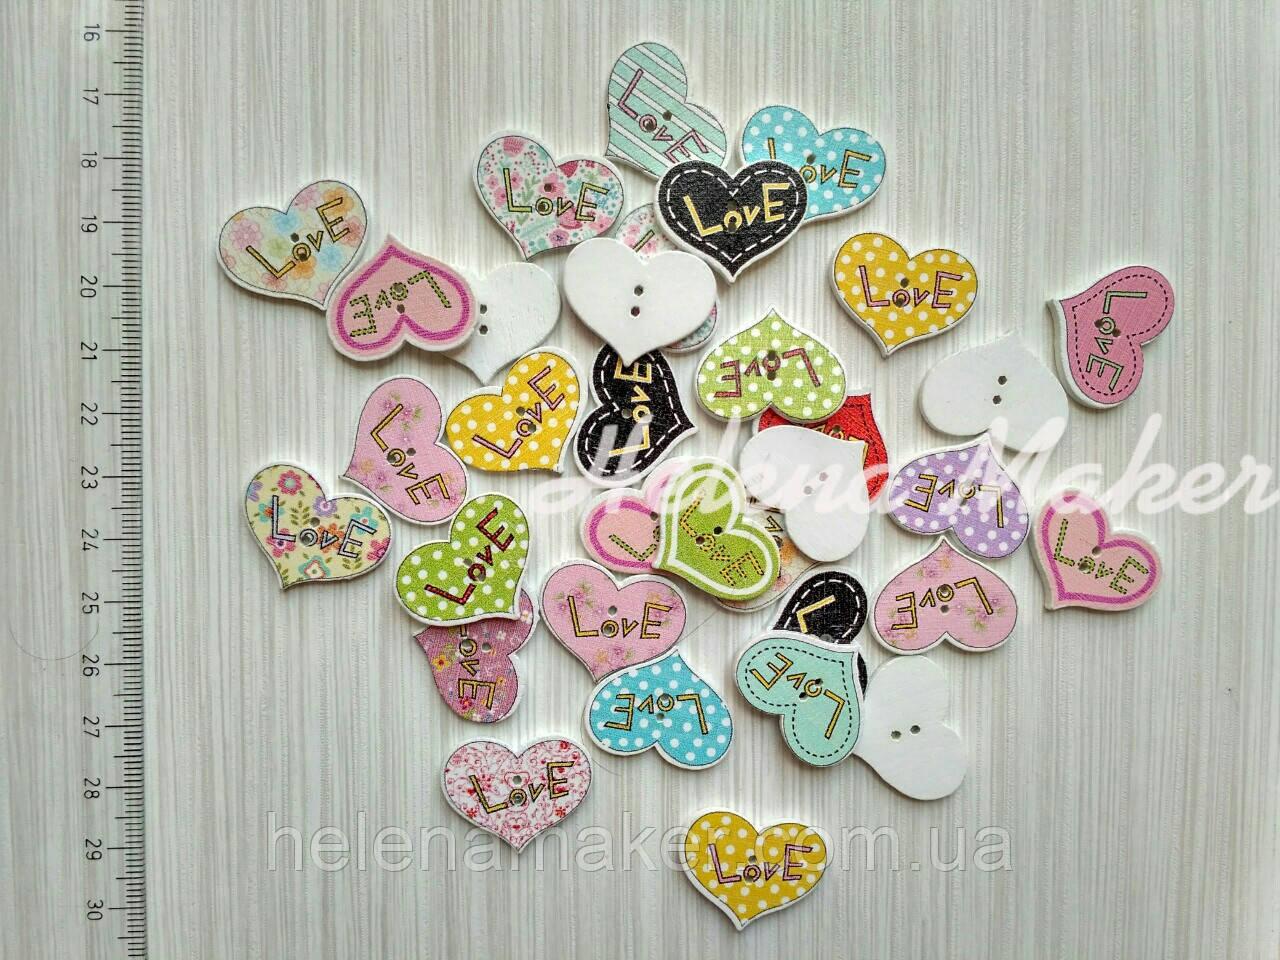 Пуговица деревянная Сердечко Love 20*25 мм